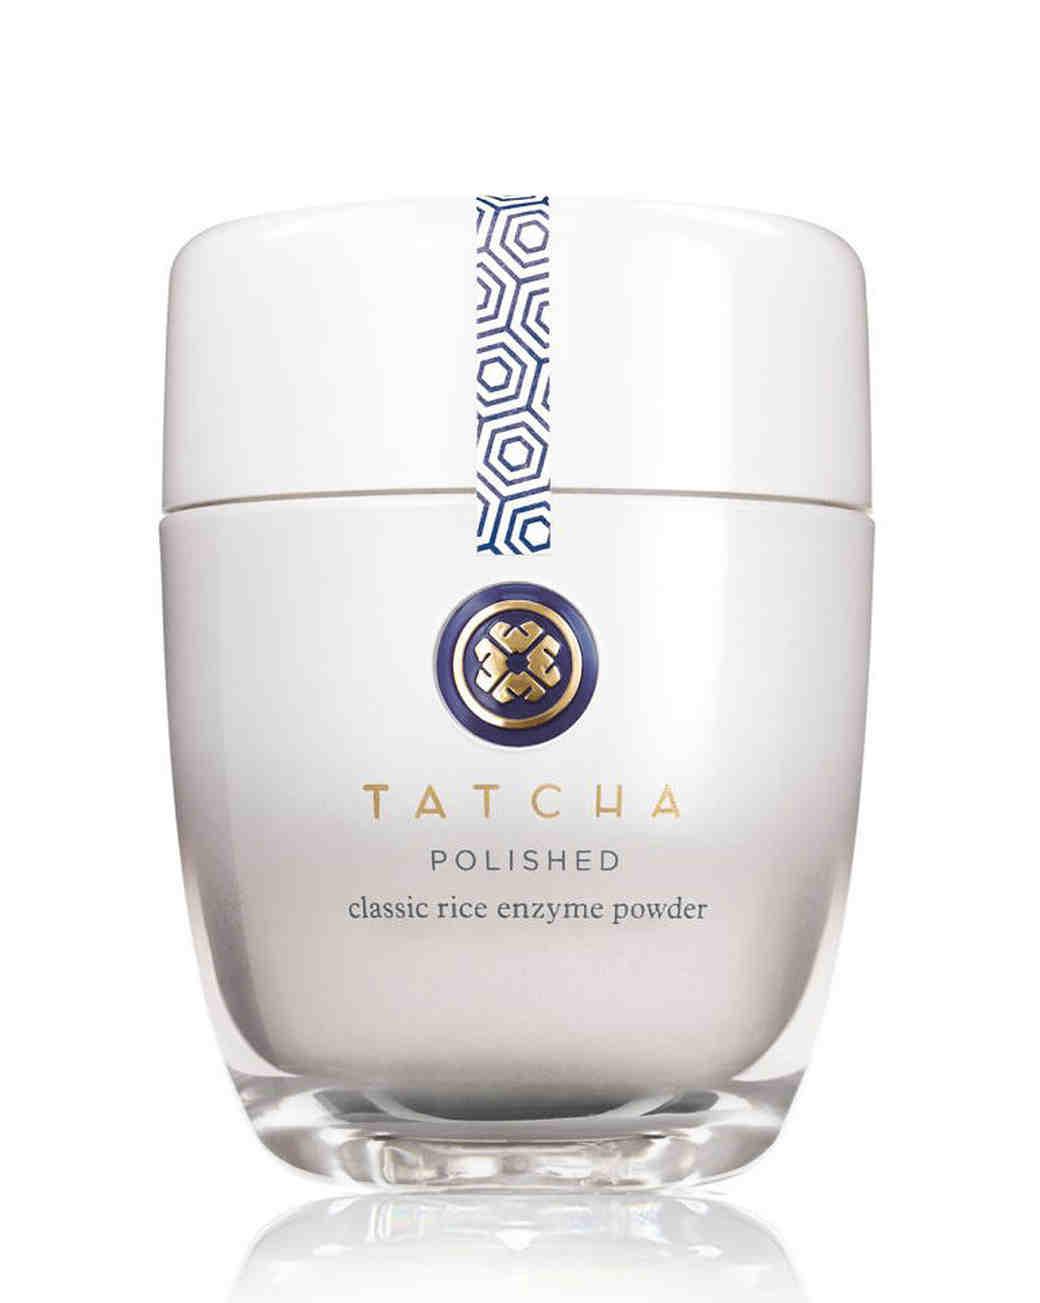 tatcha polished rice classic enzyme powder